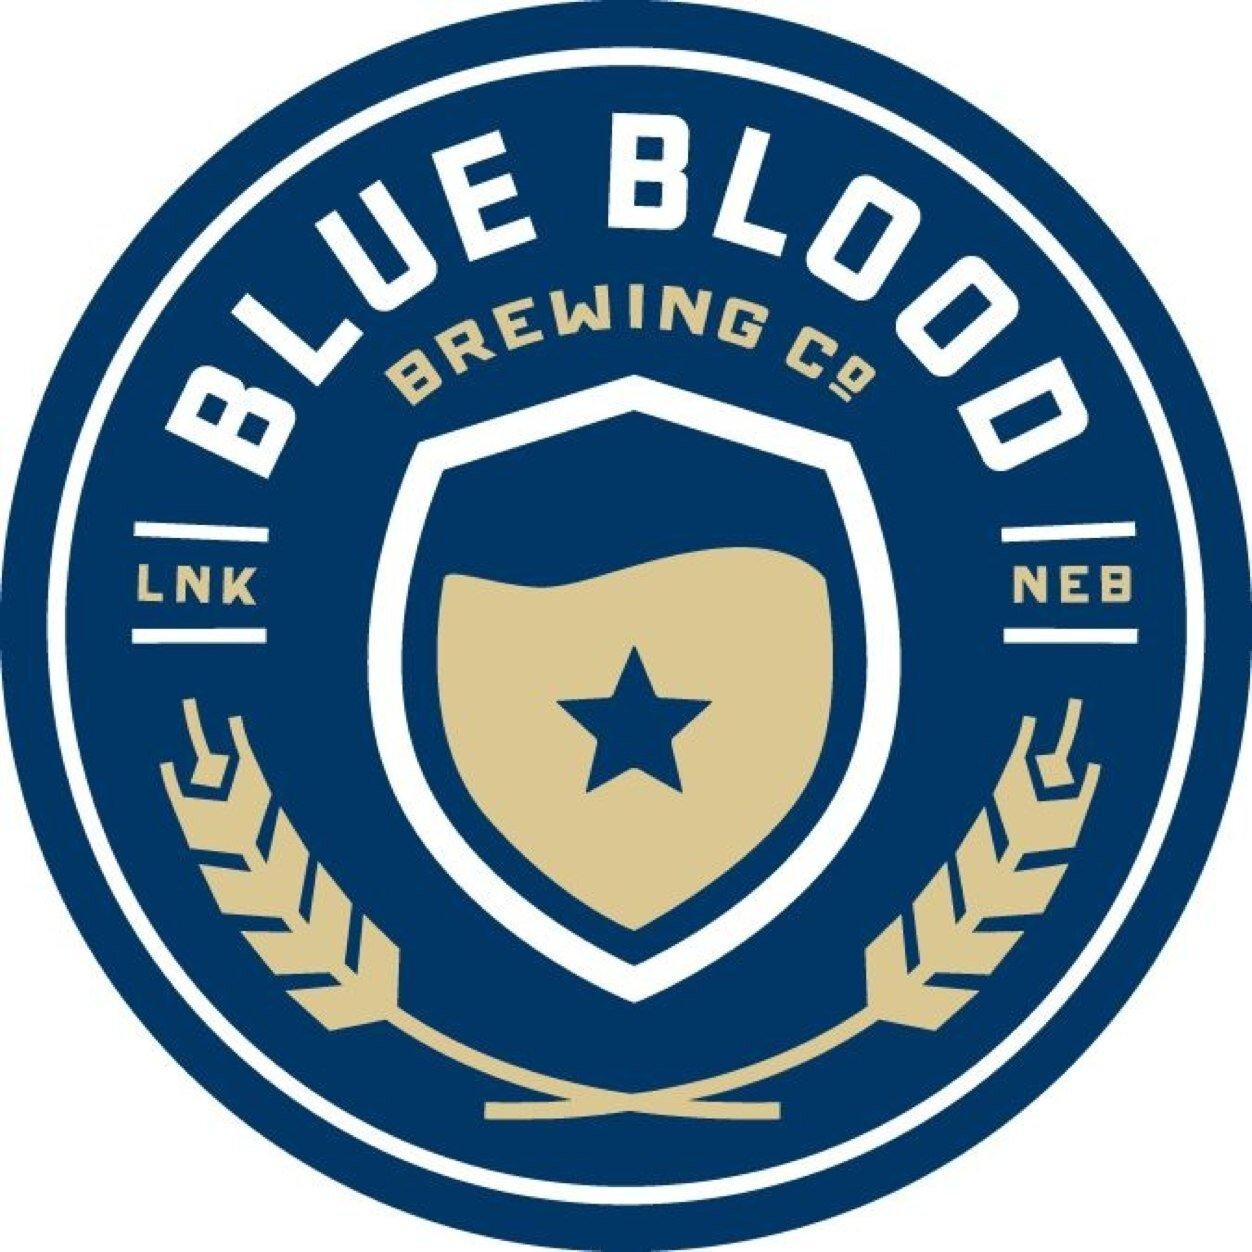 blueblood.jpeg